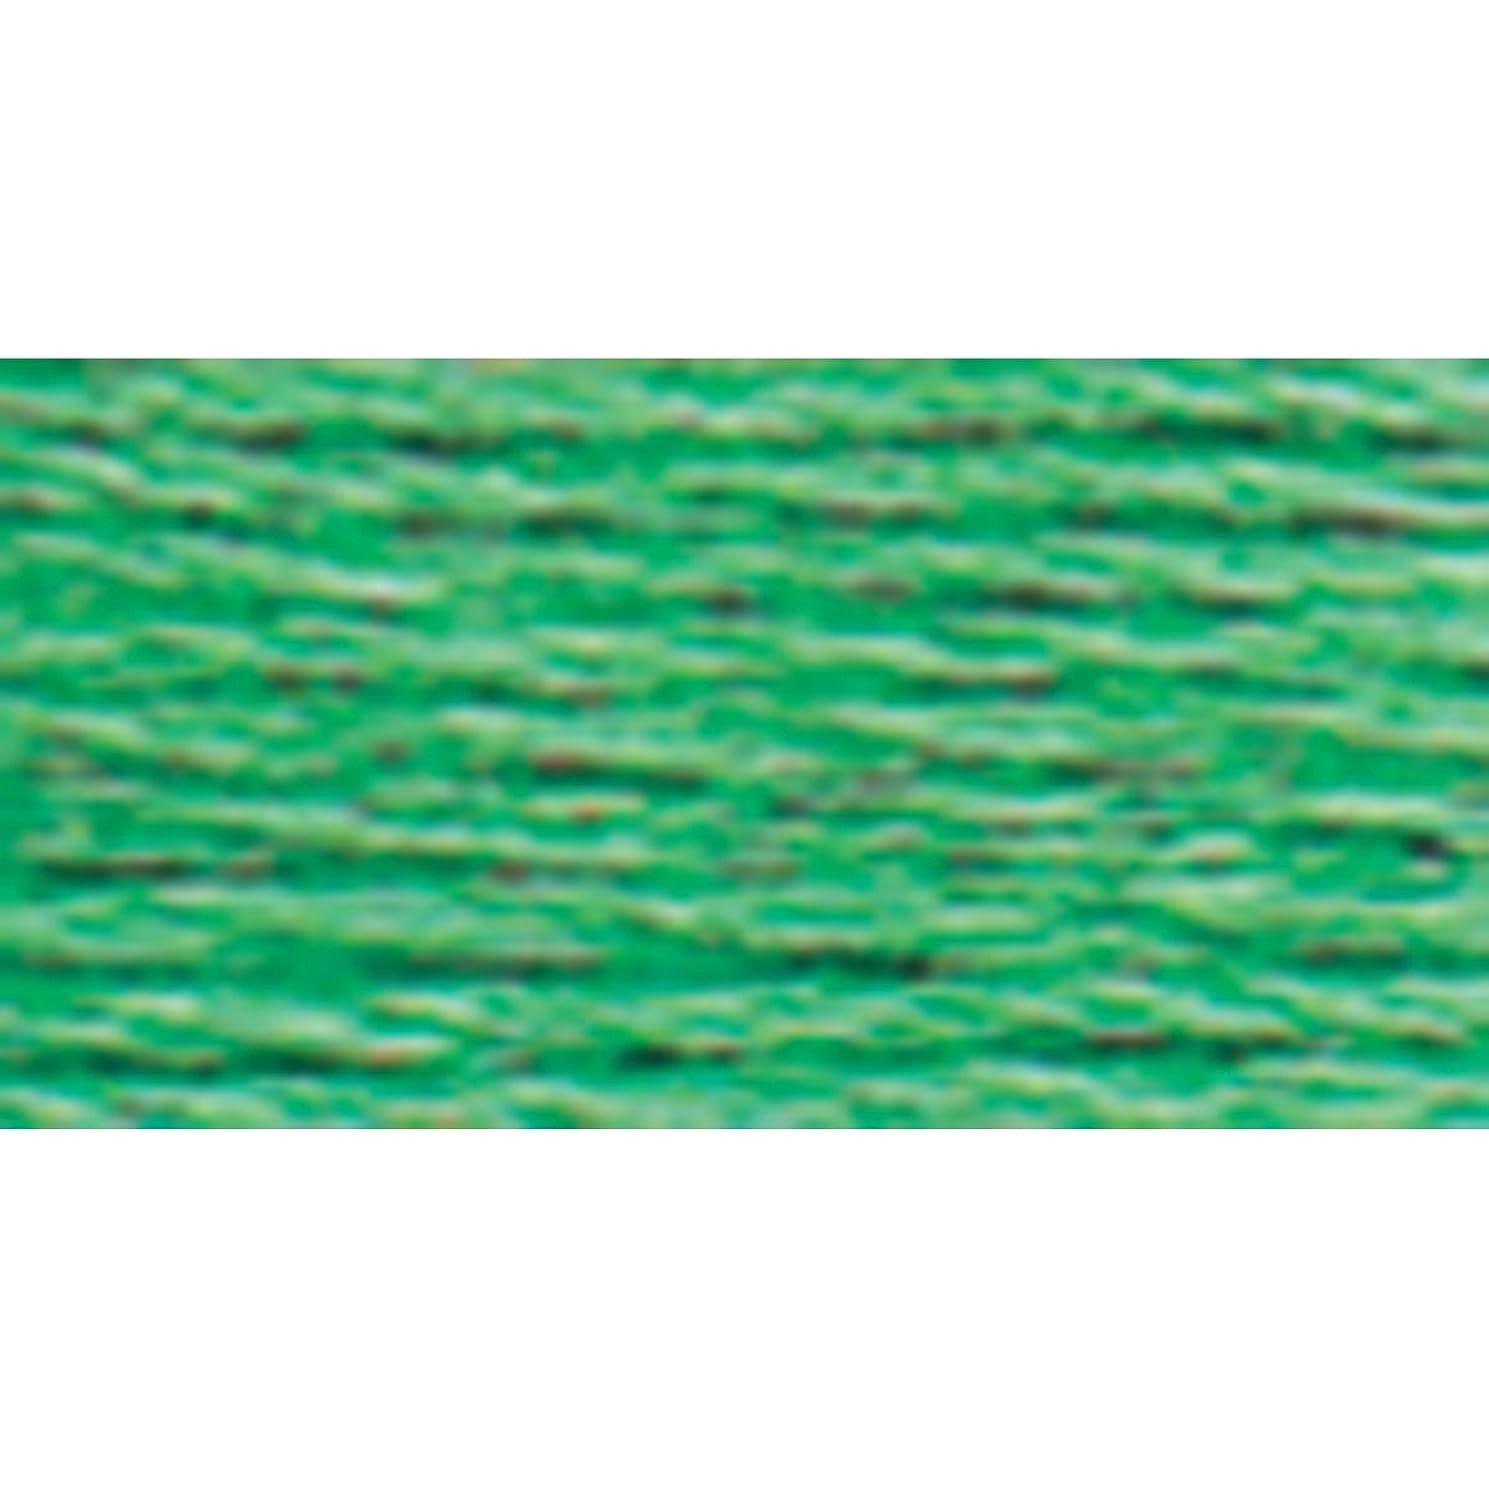 DMC 117-912 6 Strand Embroidery Cotton Floss, Light Emerald Green, 8.7-Yard